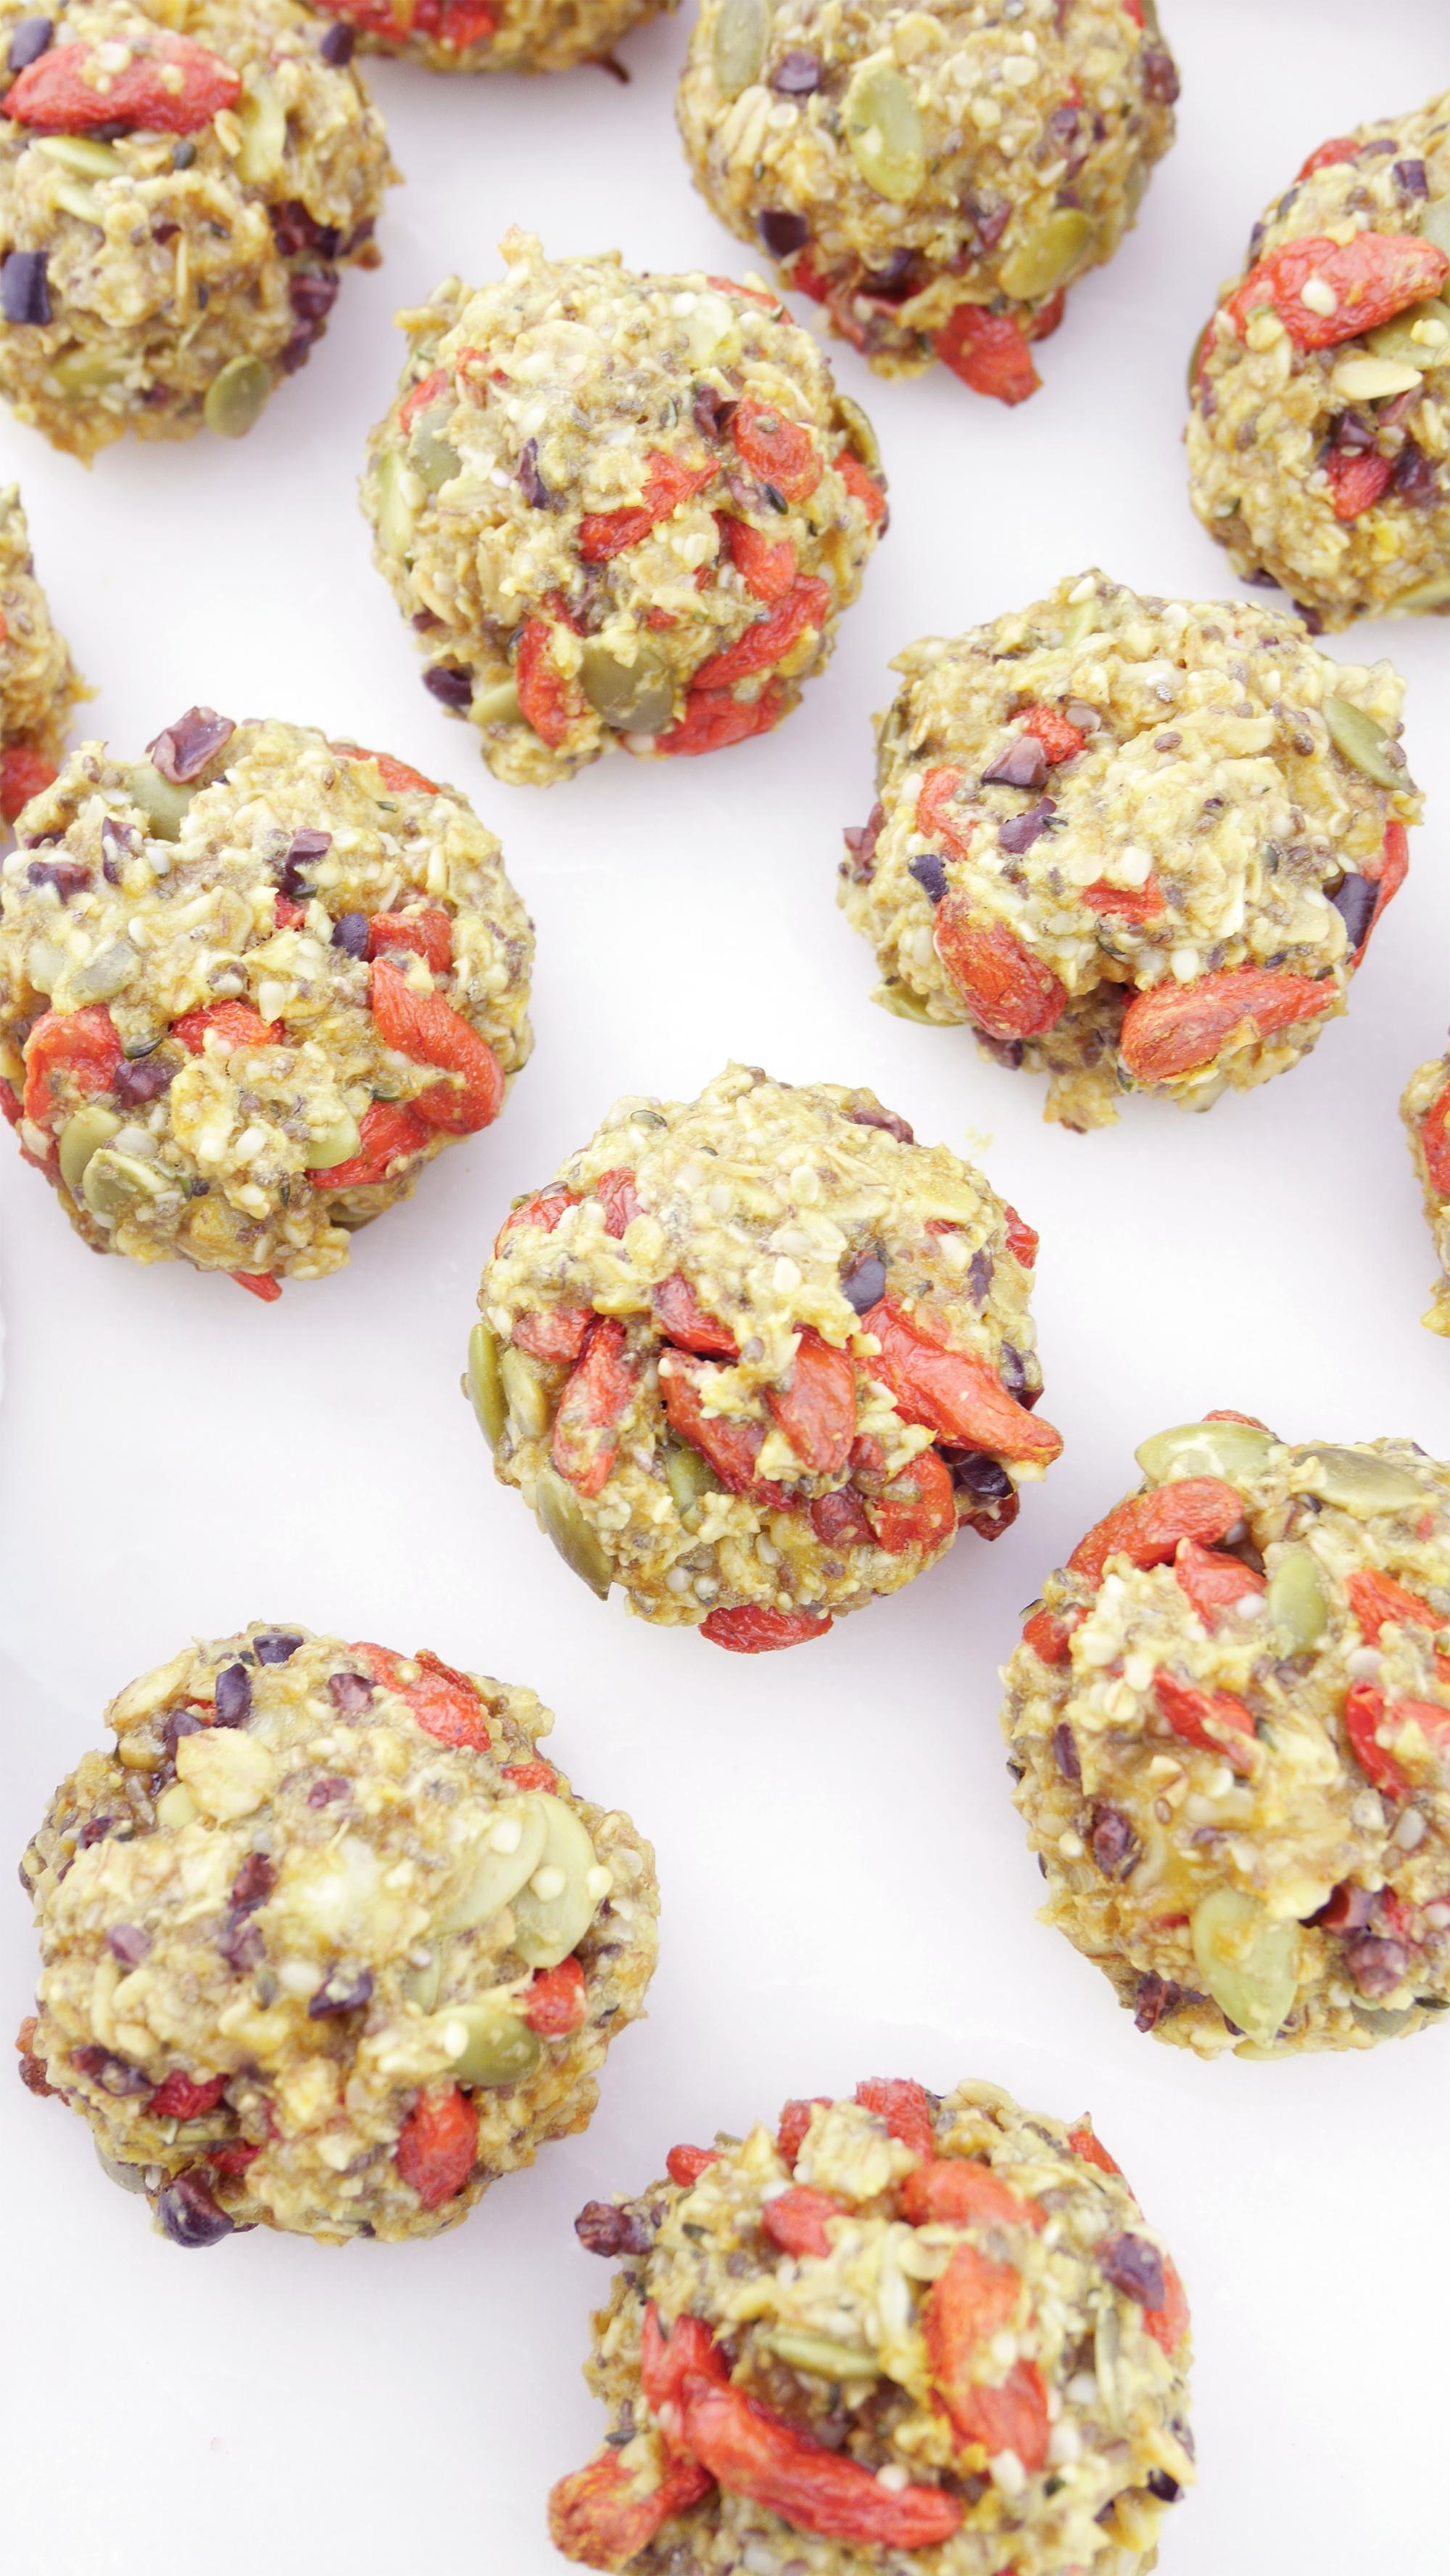 Suncore Foods Superfood Breakfast Cookies